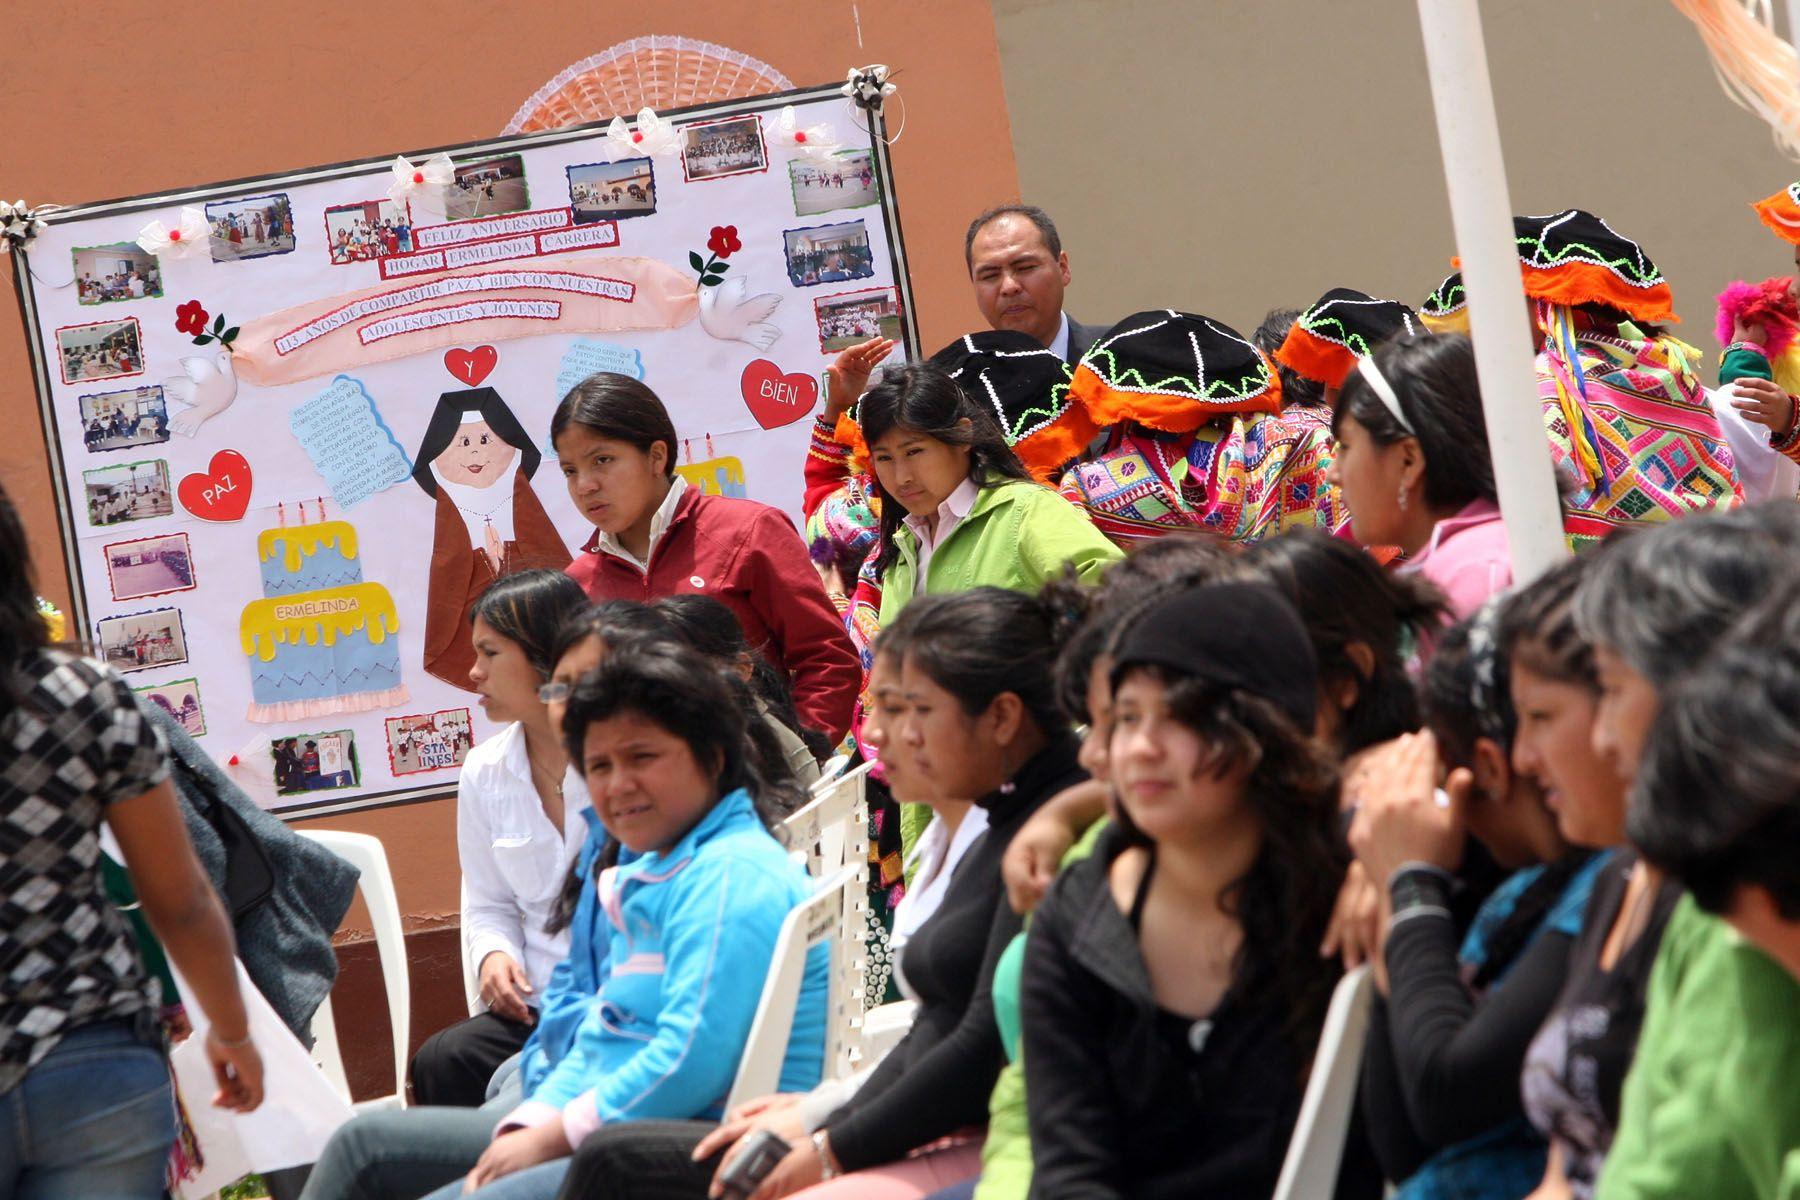 Ceremonia por aniversario del Centro Ermelinda Carrera. Foto: ANDINA / Carolina Urra.